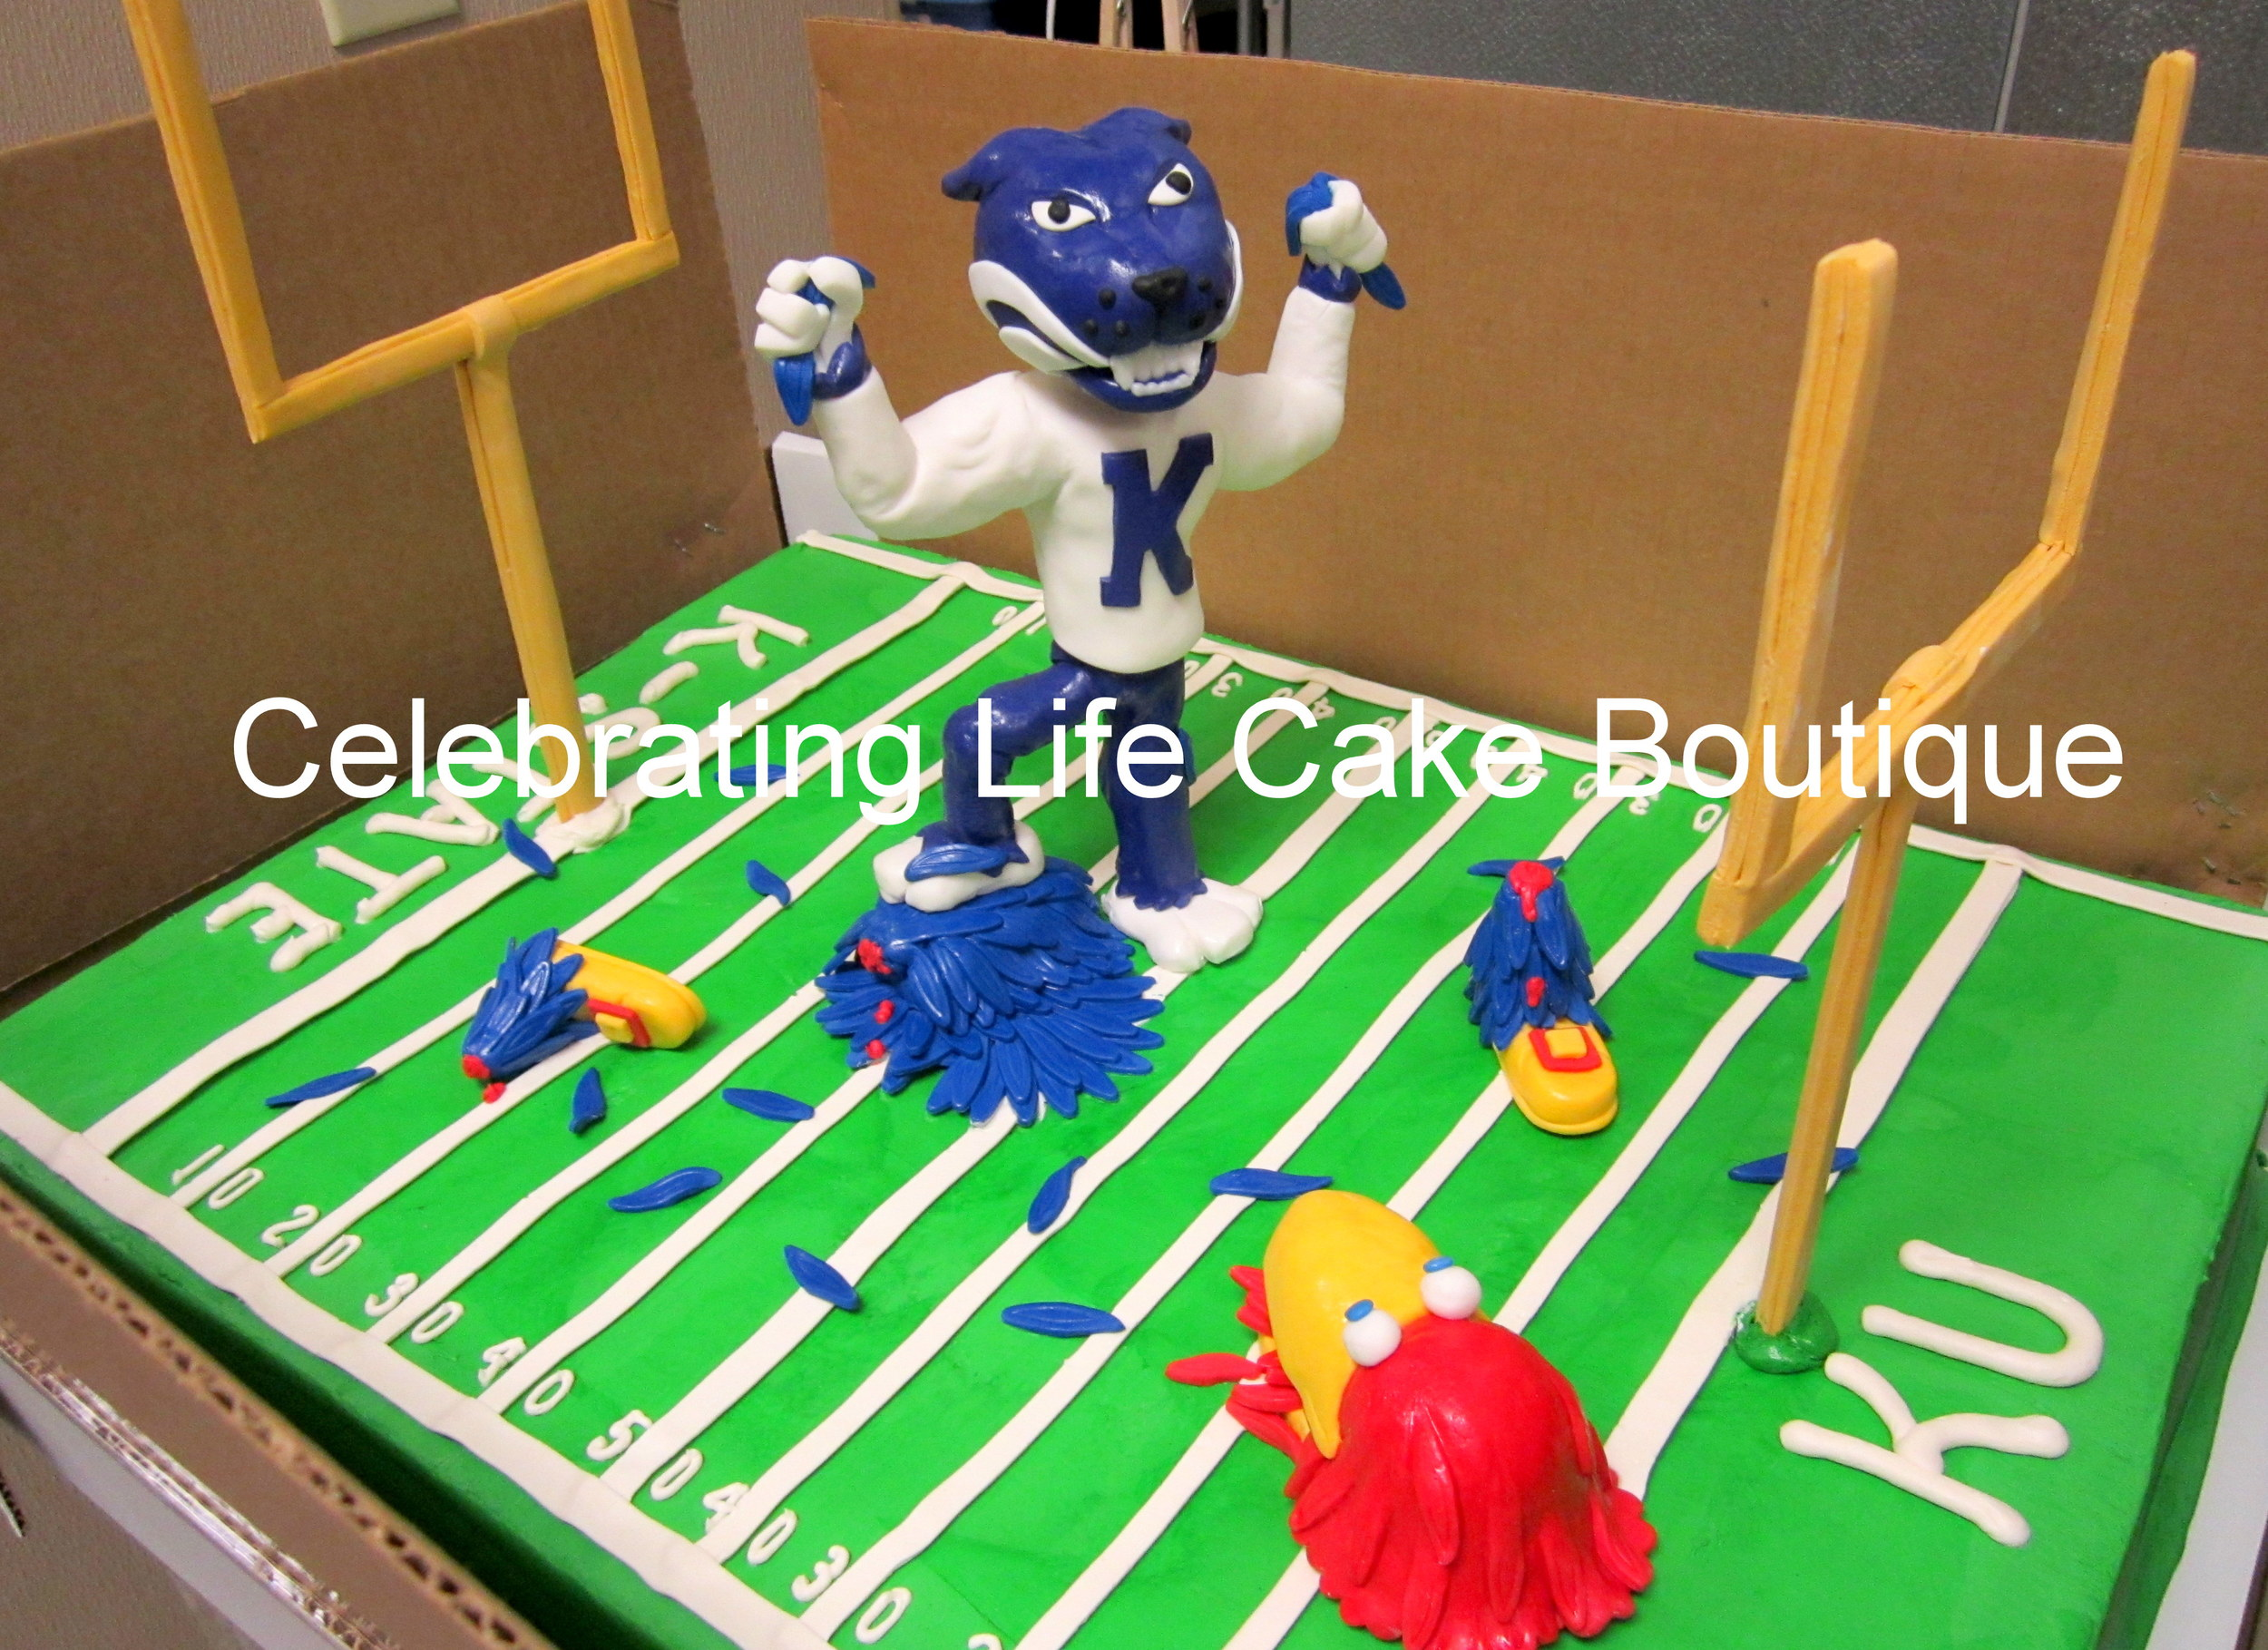 ku-kstate football mascot rivalry cake.jpg